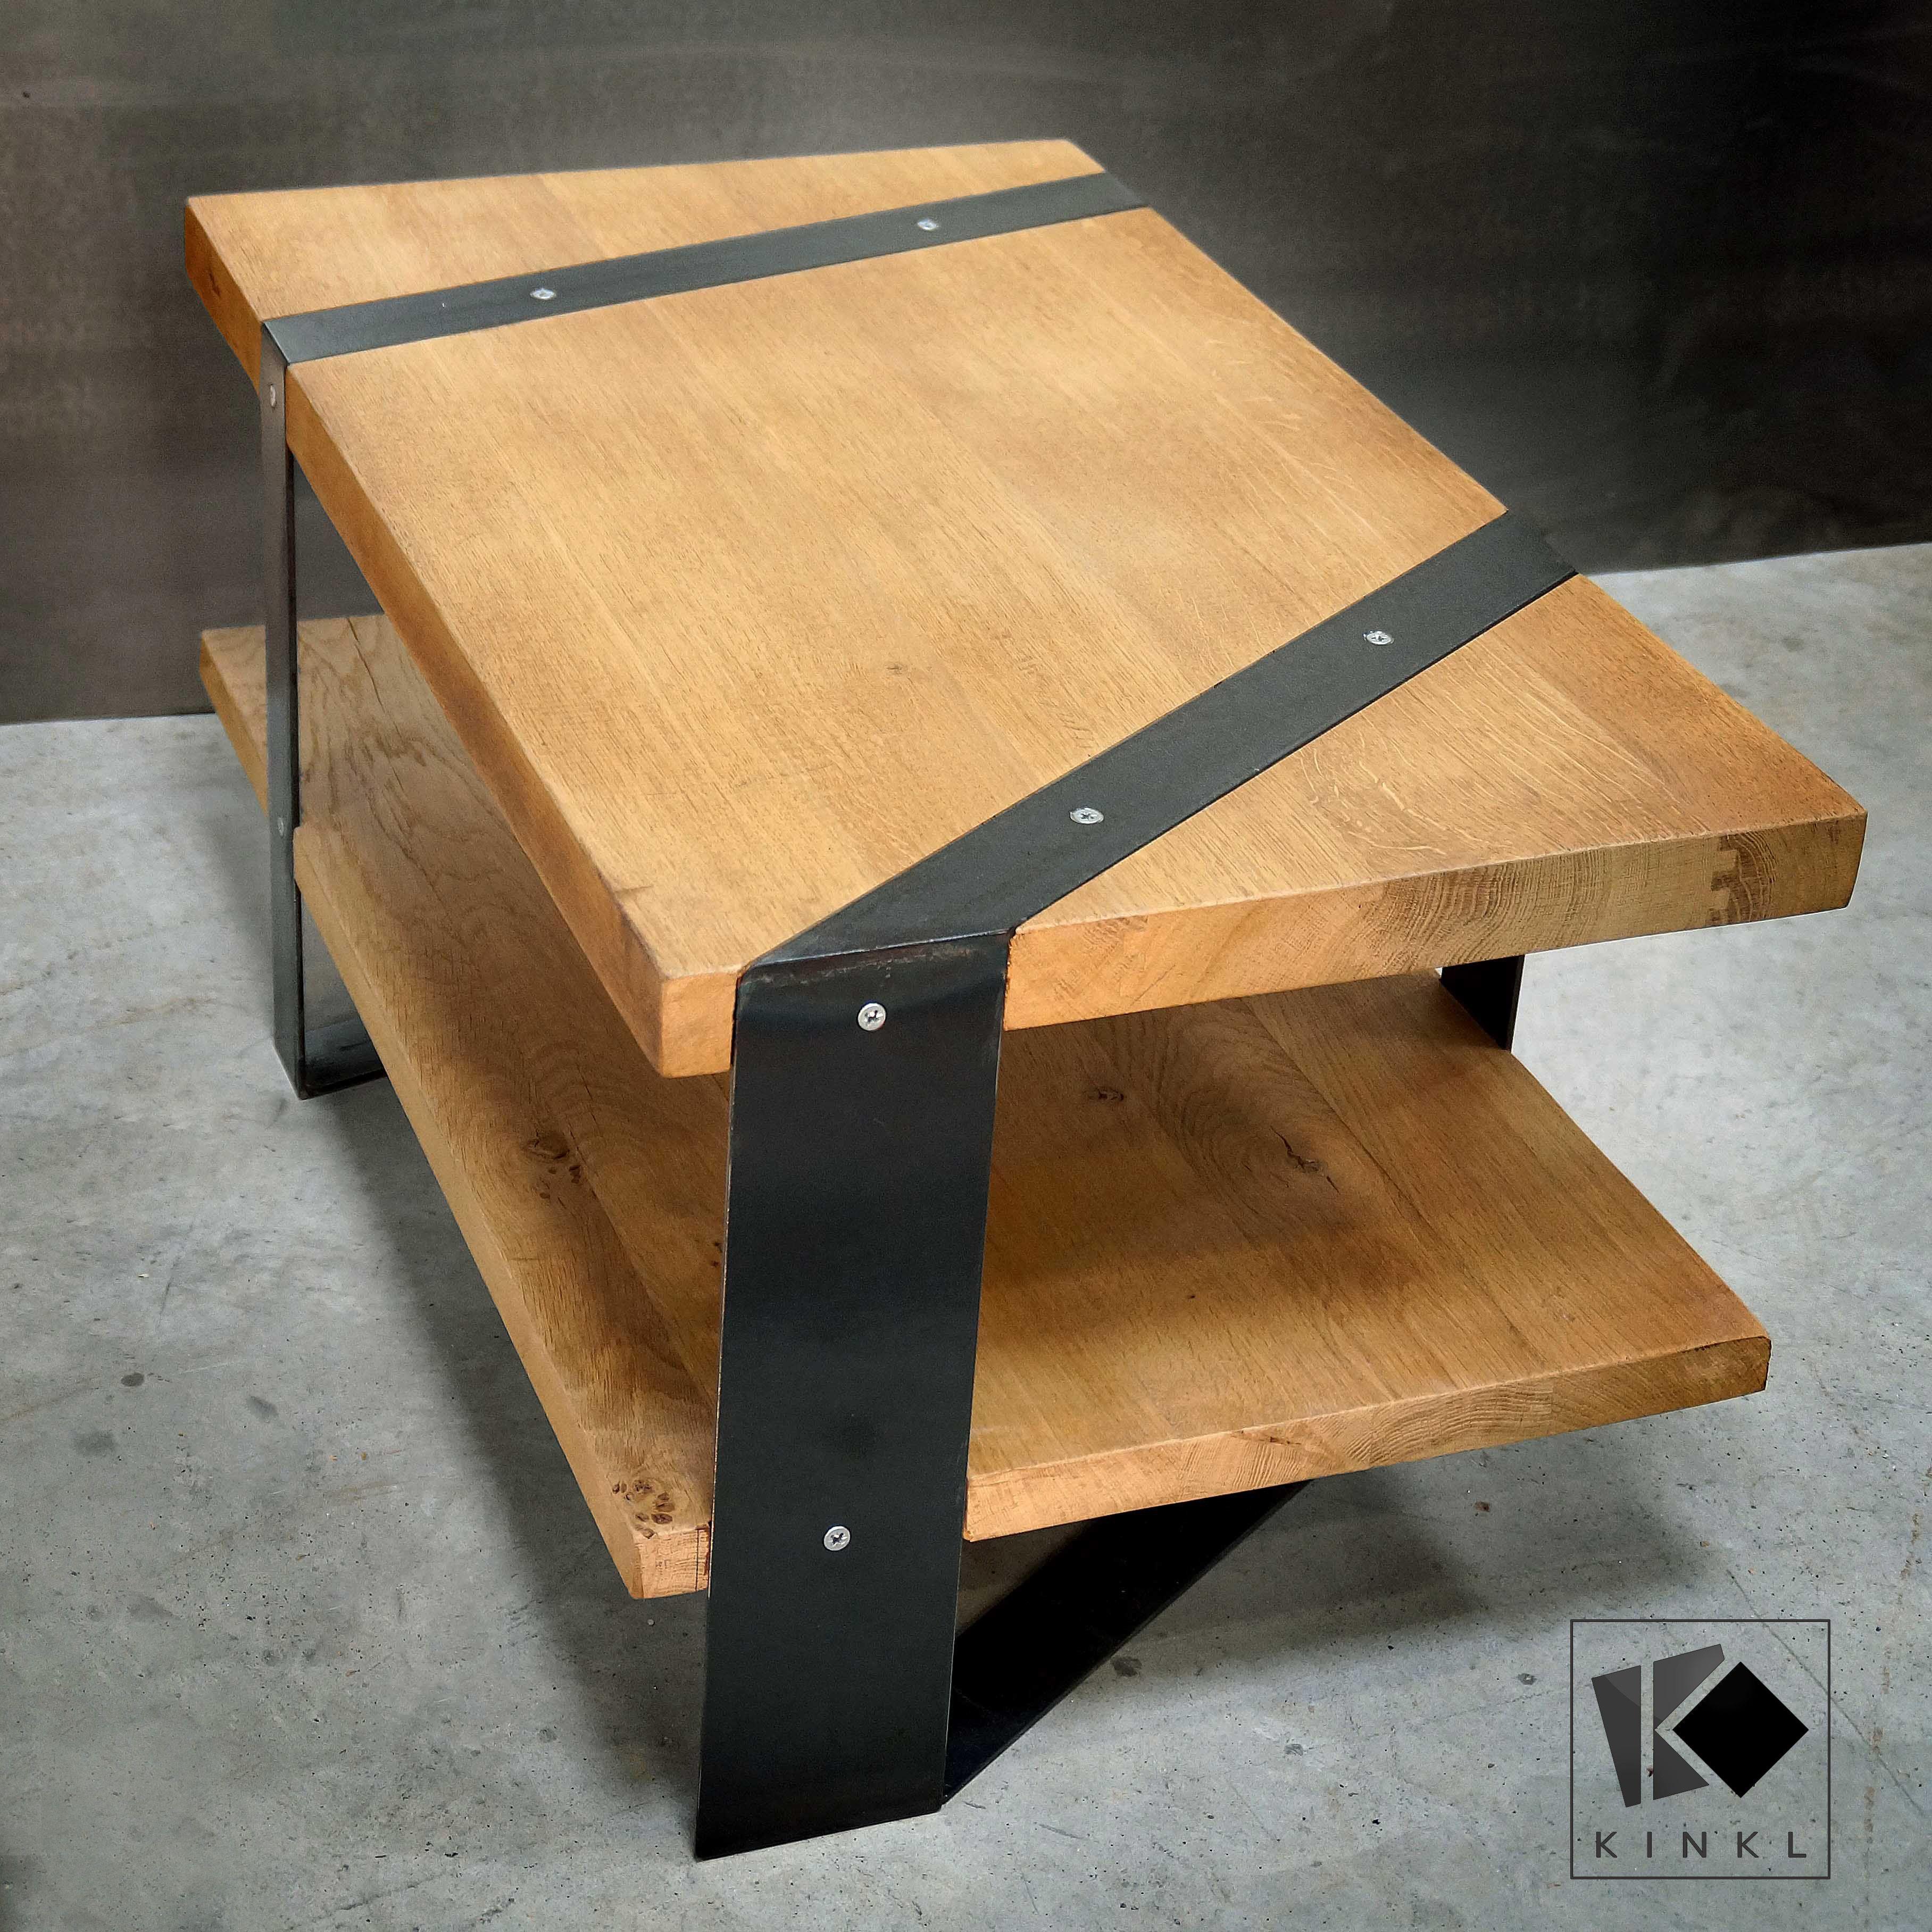 métalдекорMöbelideen Kinkl table Kinkl bois basse oQCxdBeErW